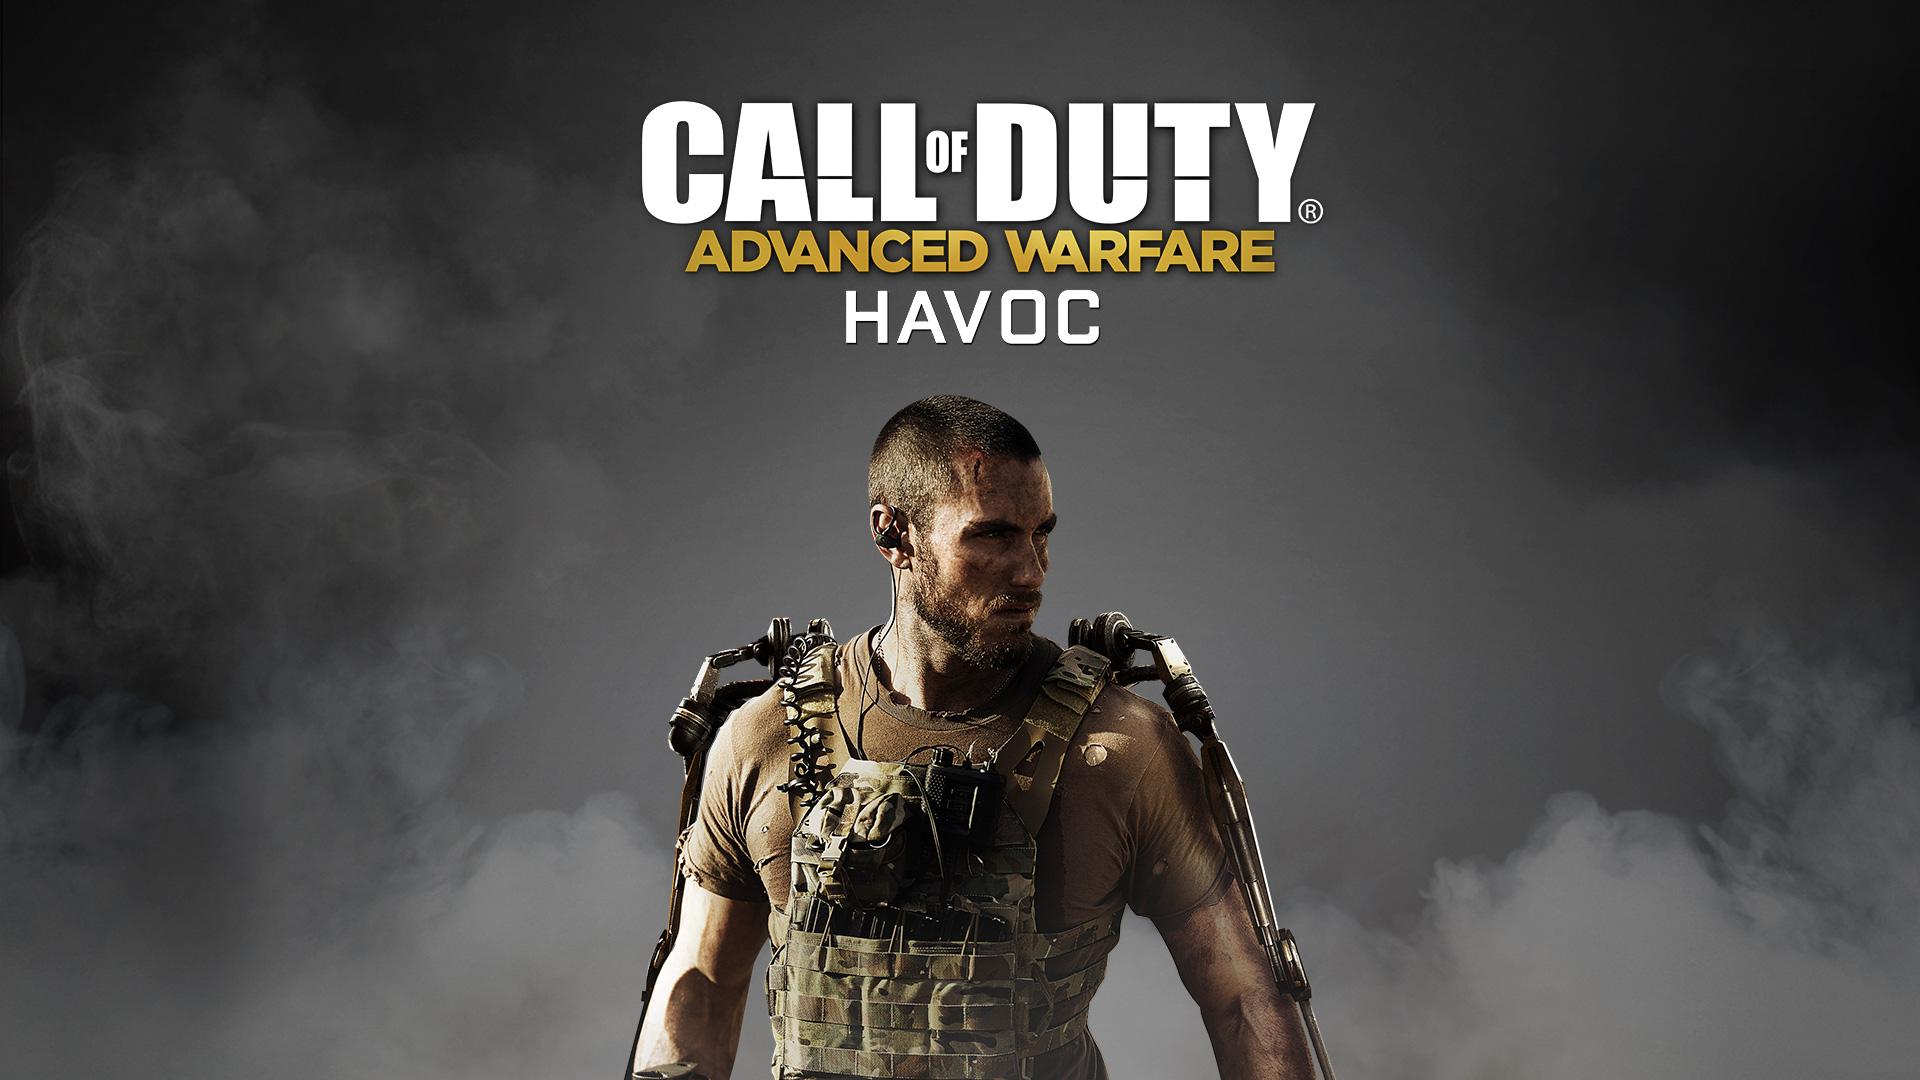 Call of Duty: Advanced Warfare | Havoc DLC Call Of Duty Advanced Warfare Dlc Map Packs on